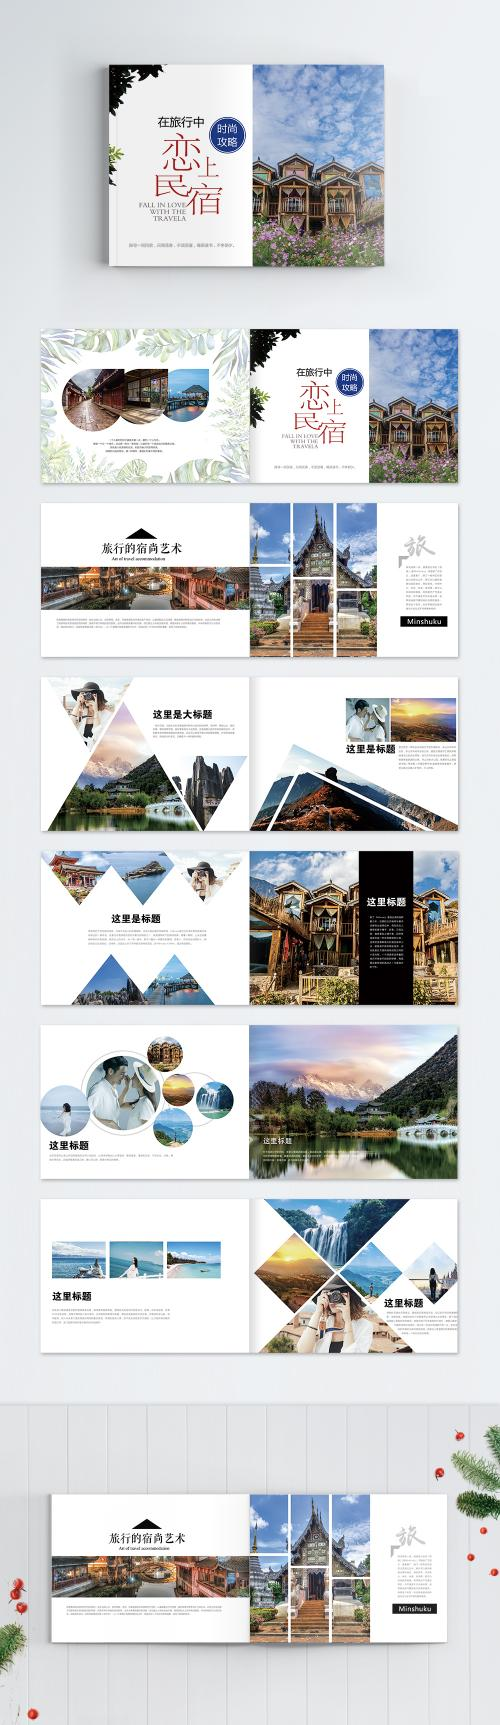 LovePik - tourist brochure - 400351073